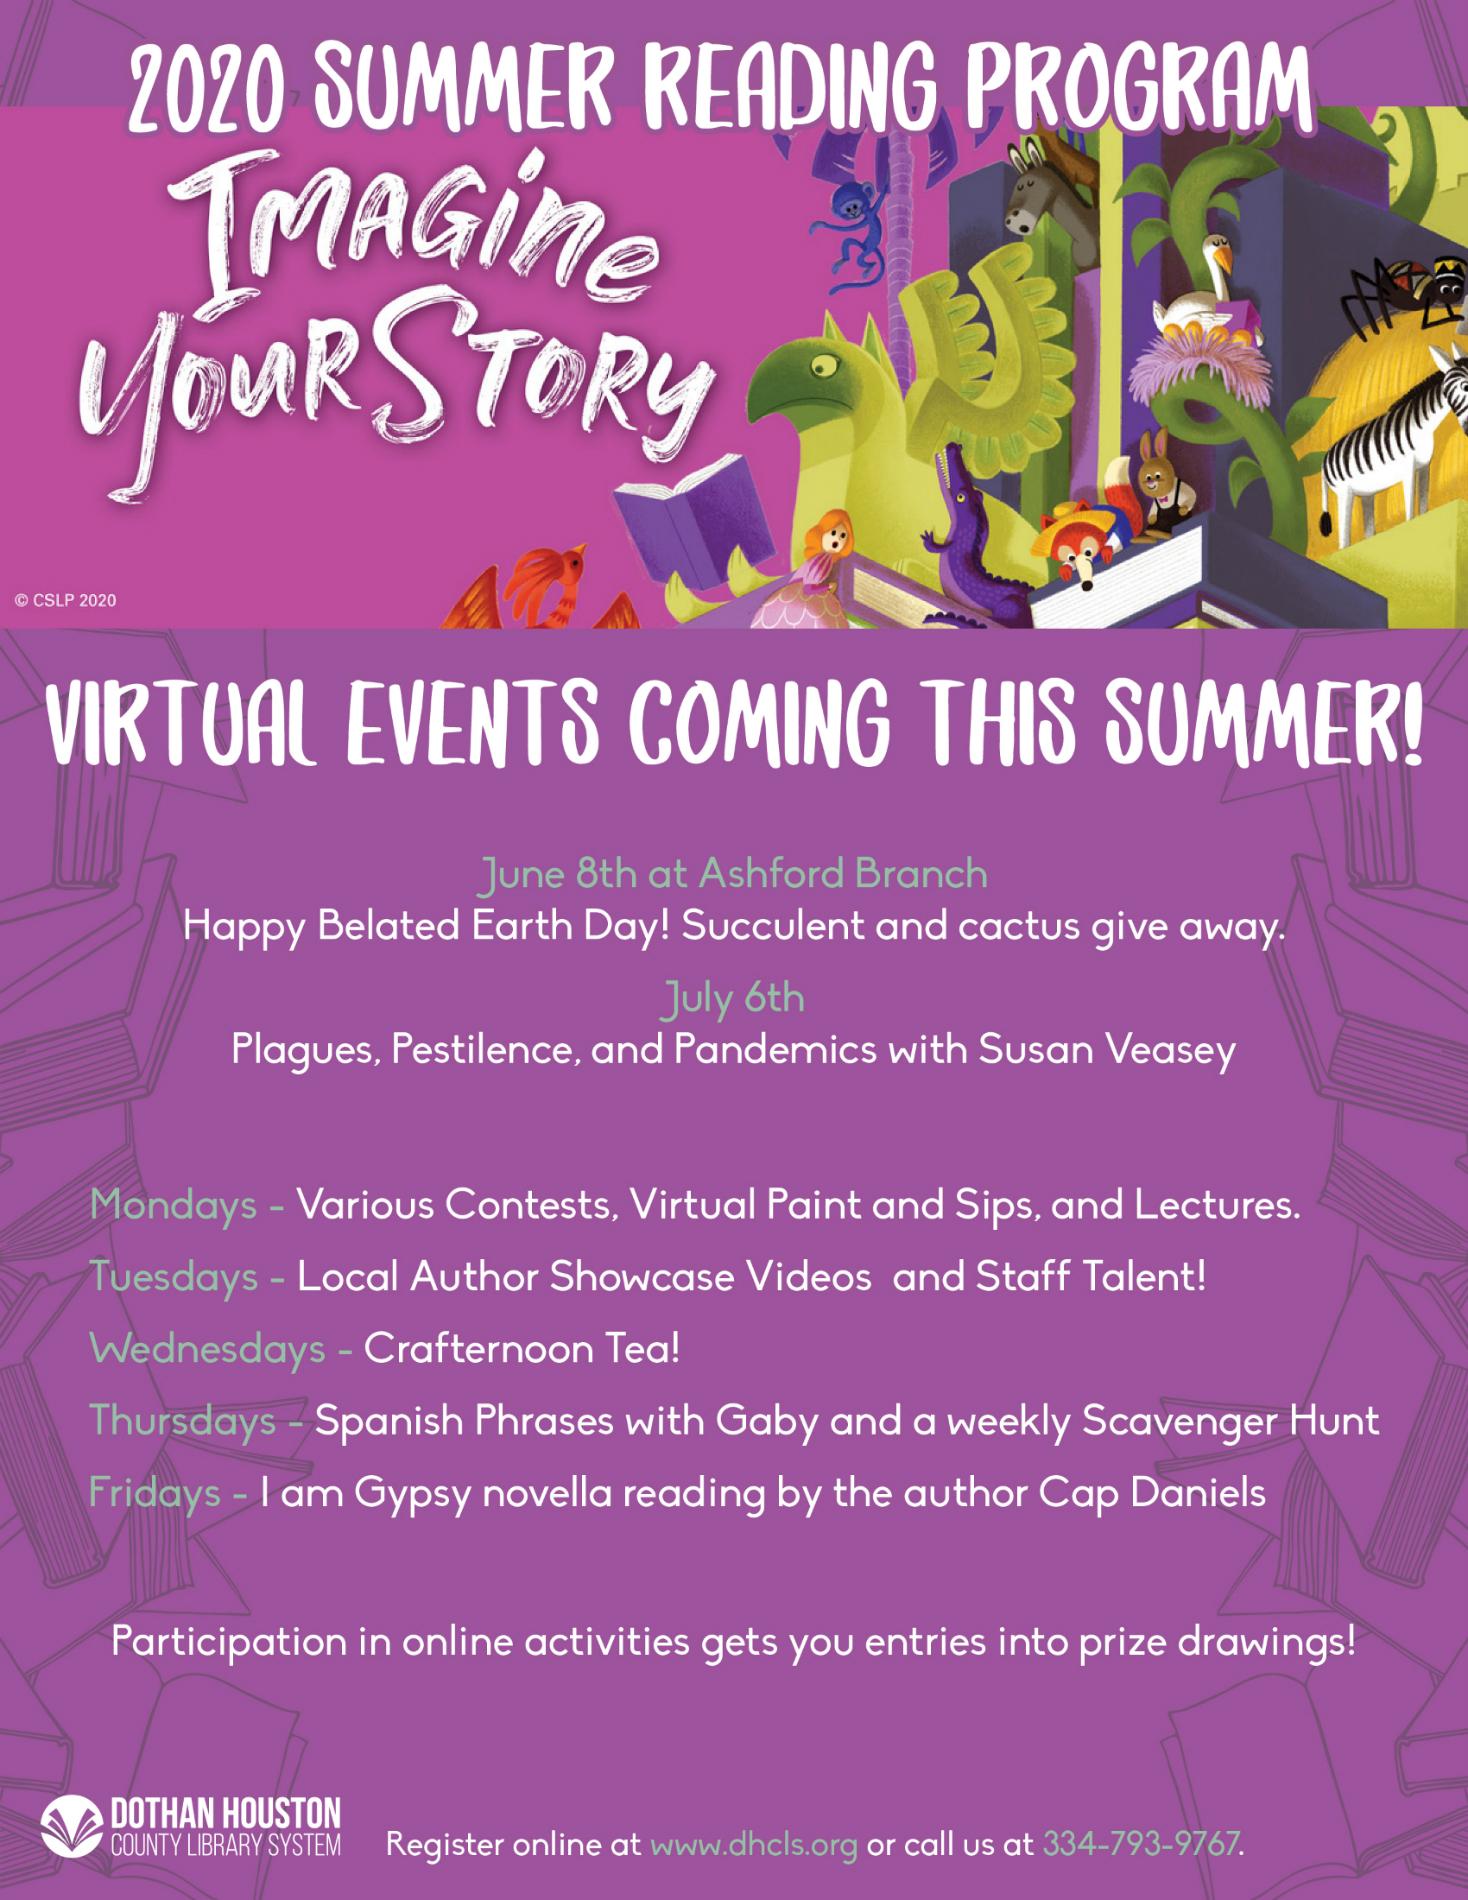 Imagine Your Story - 2020 Summer Reading Program